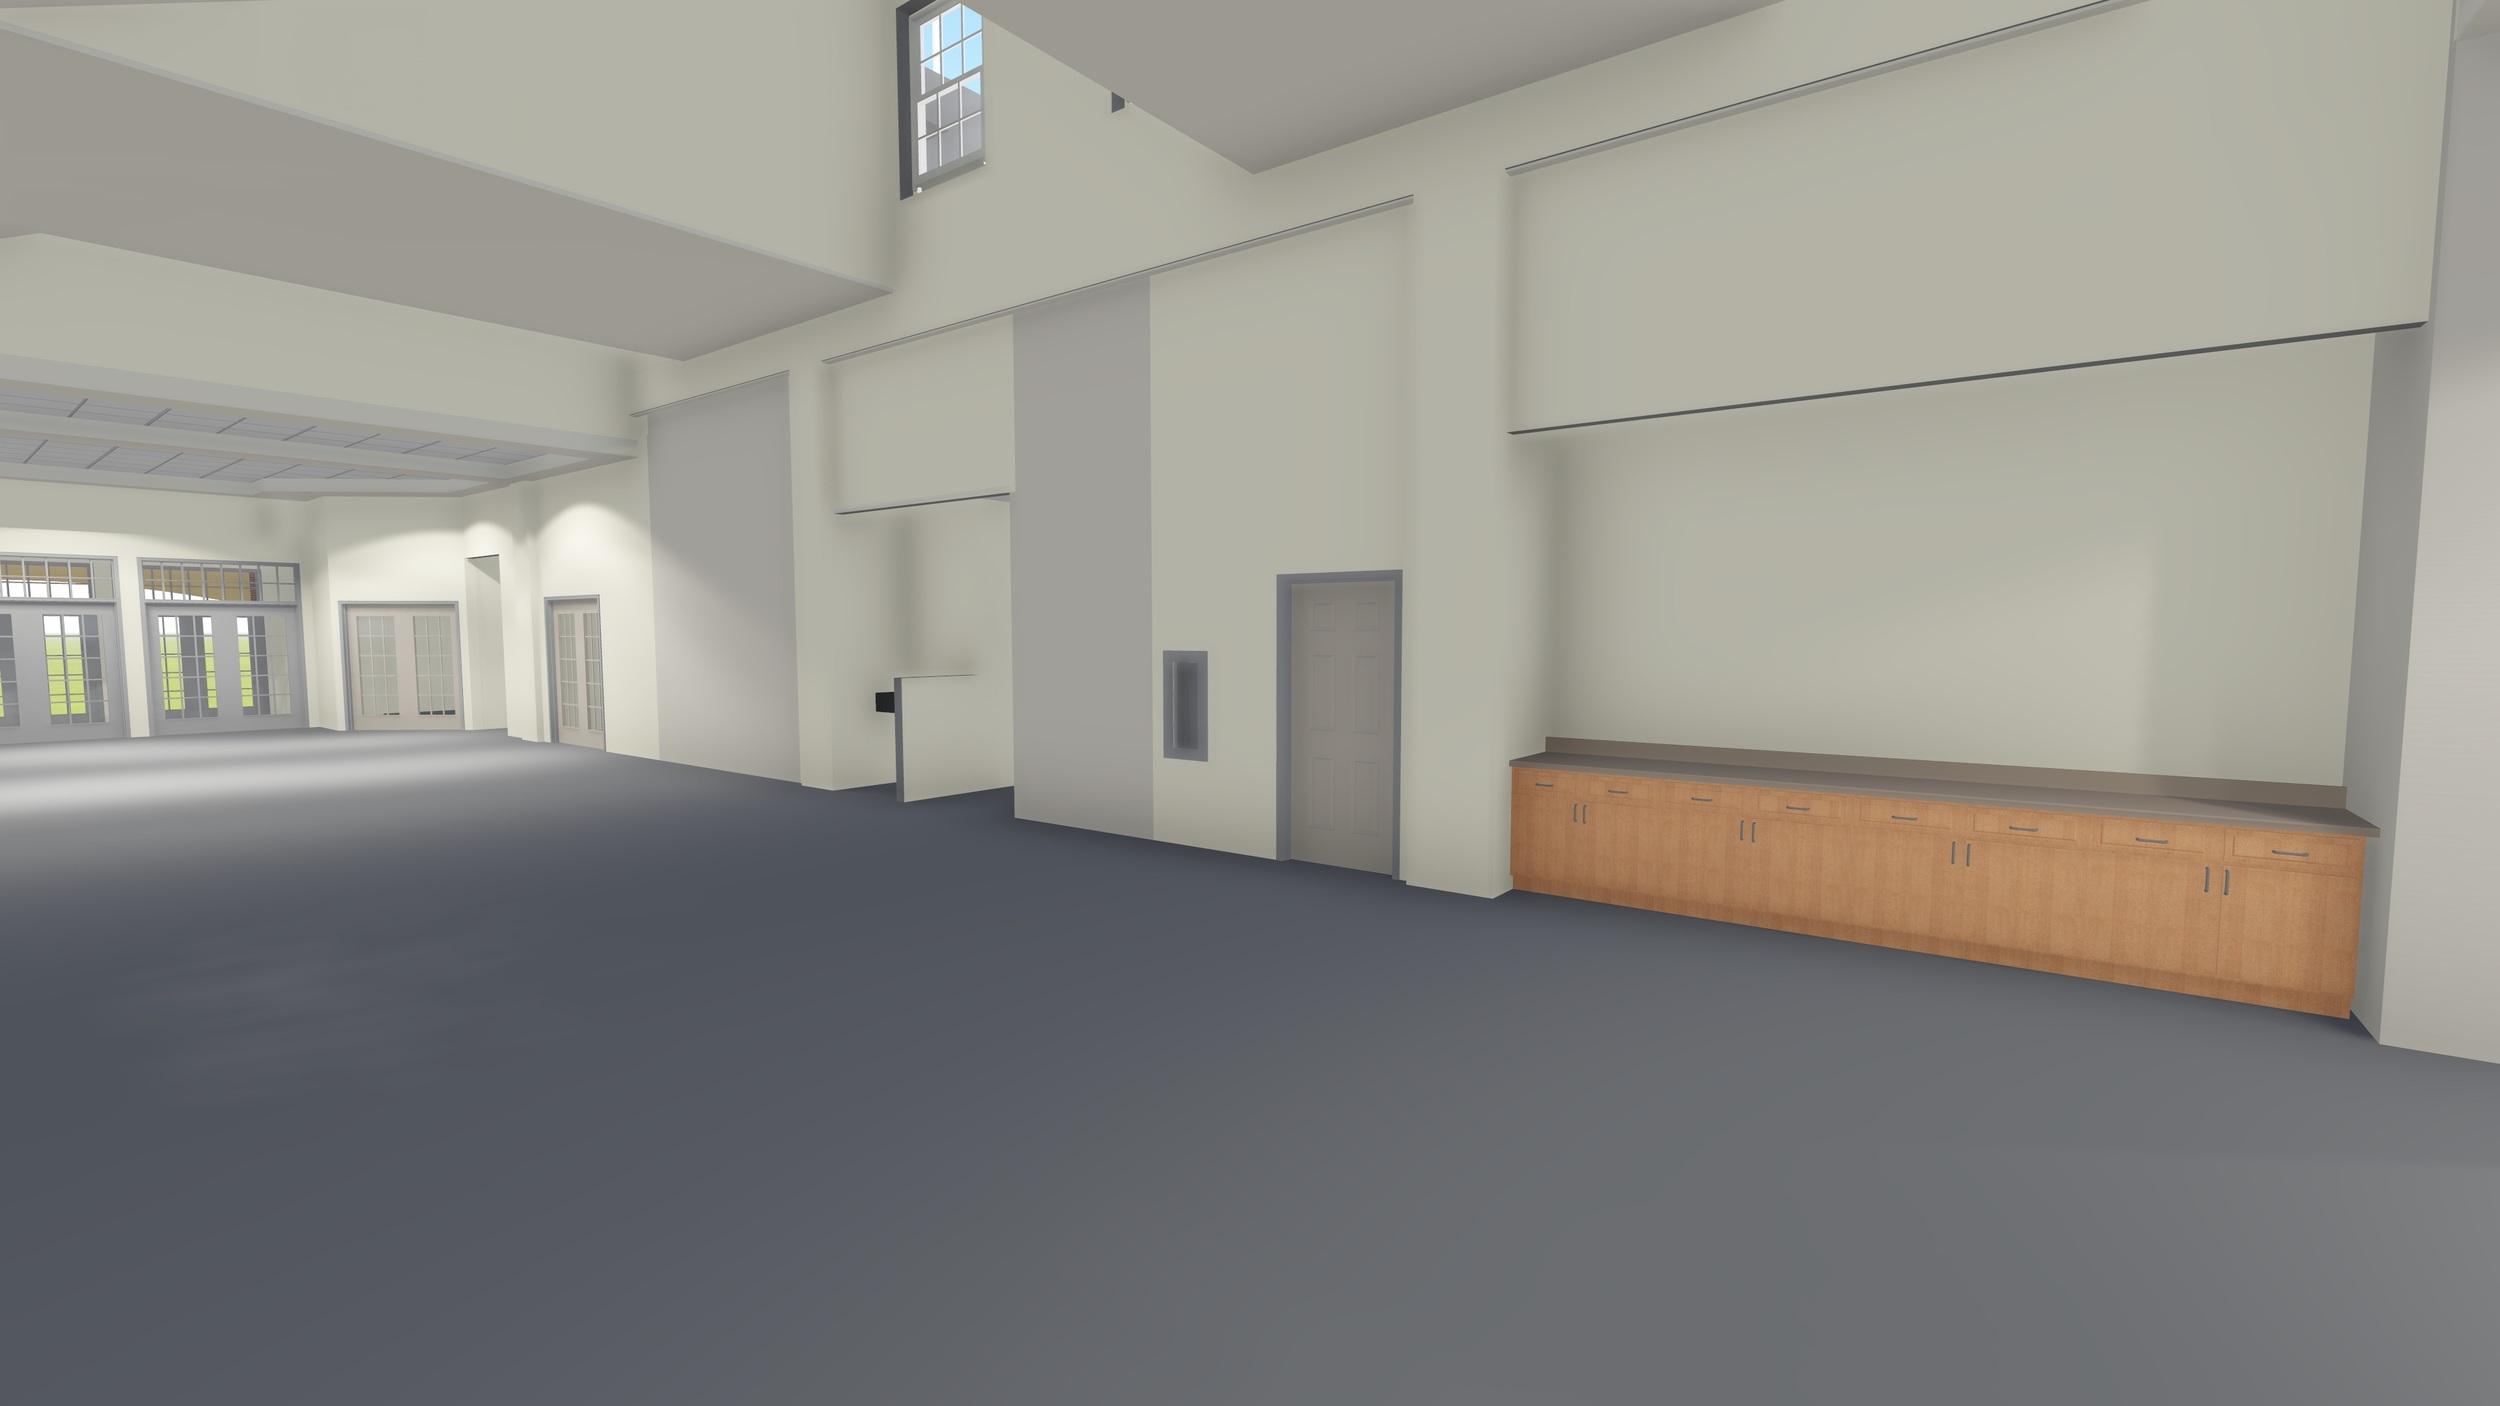 Interior Images11.jpg